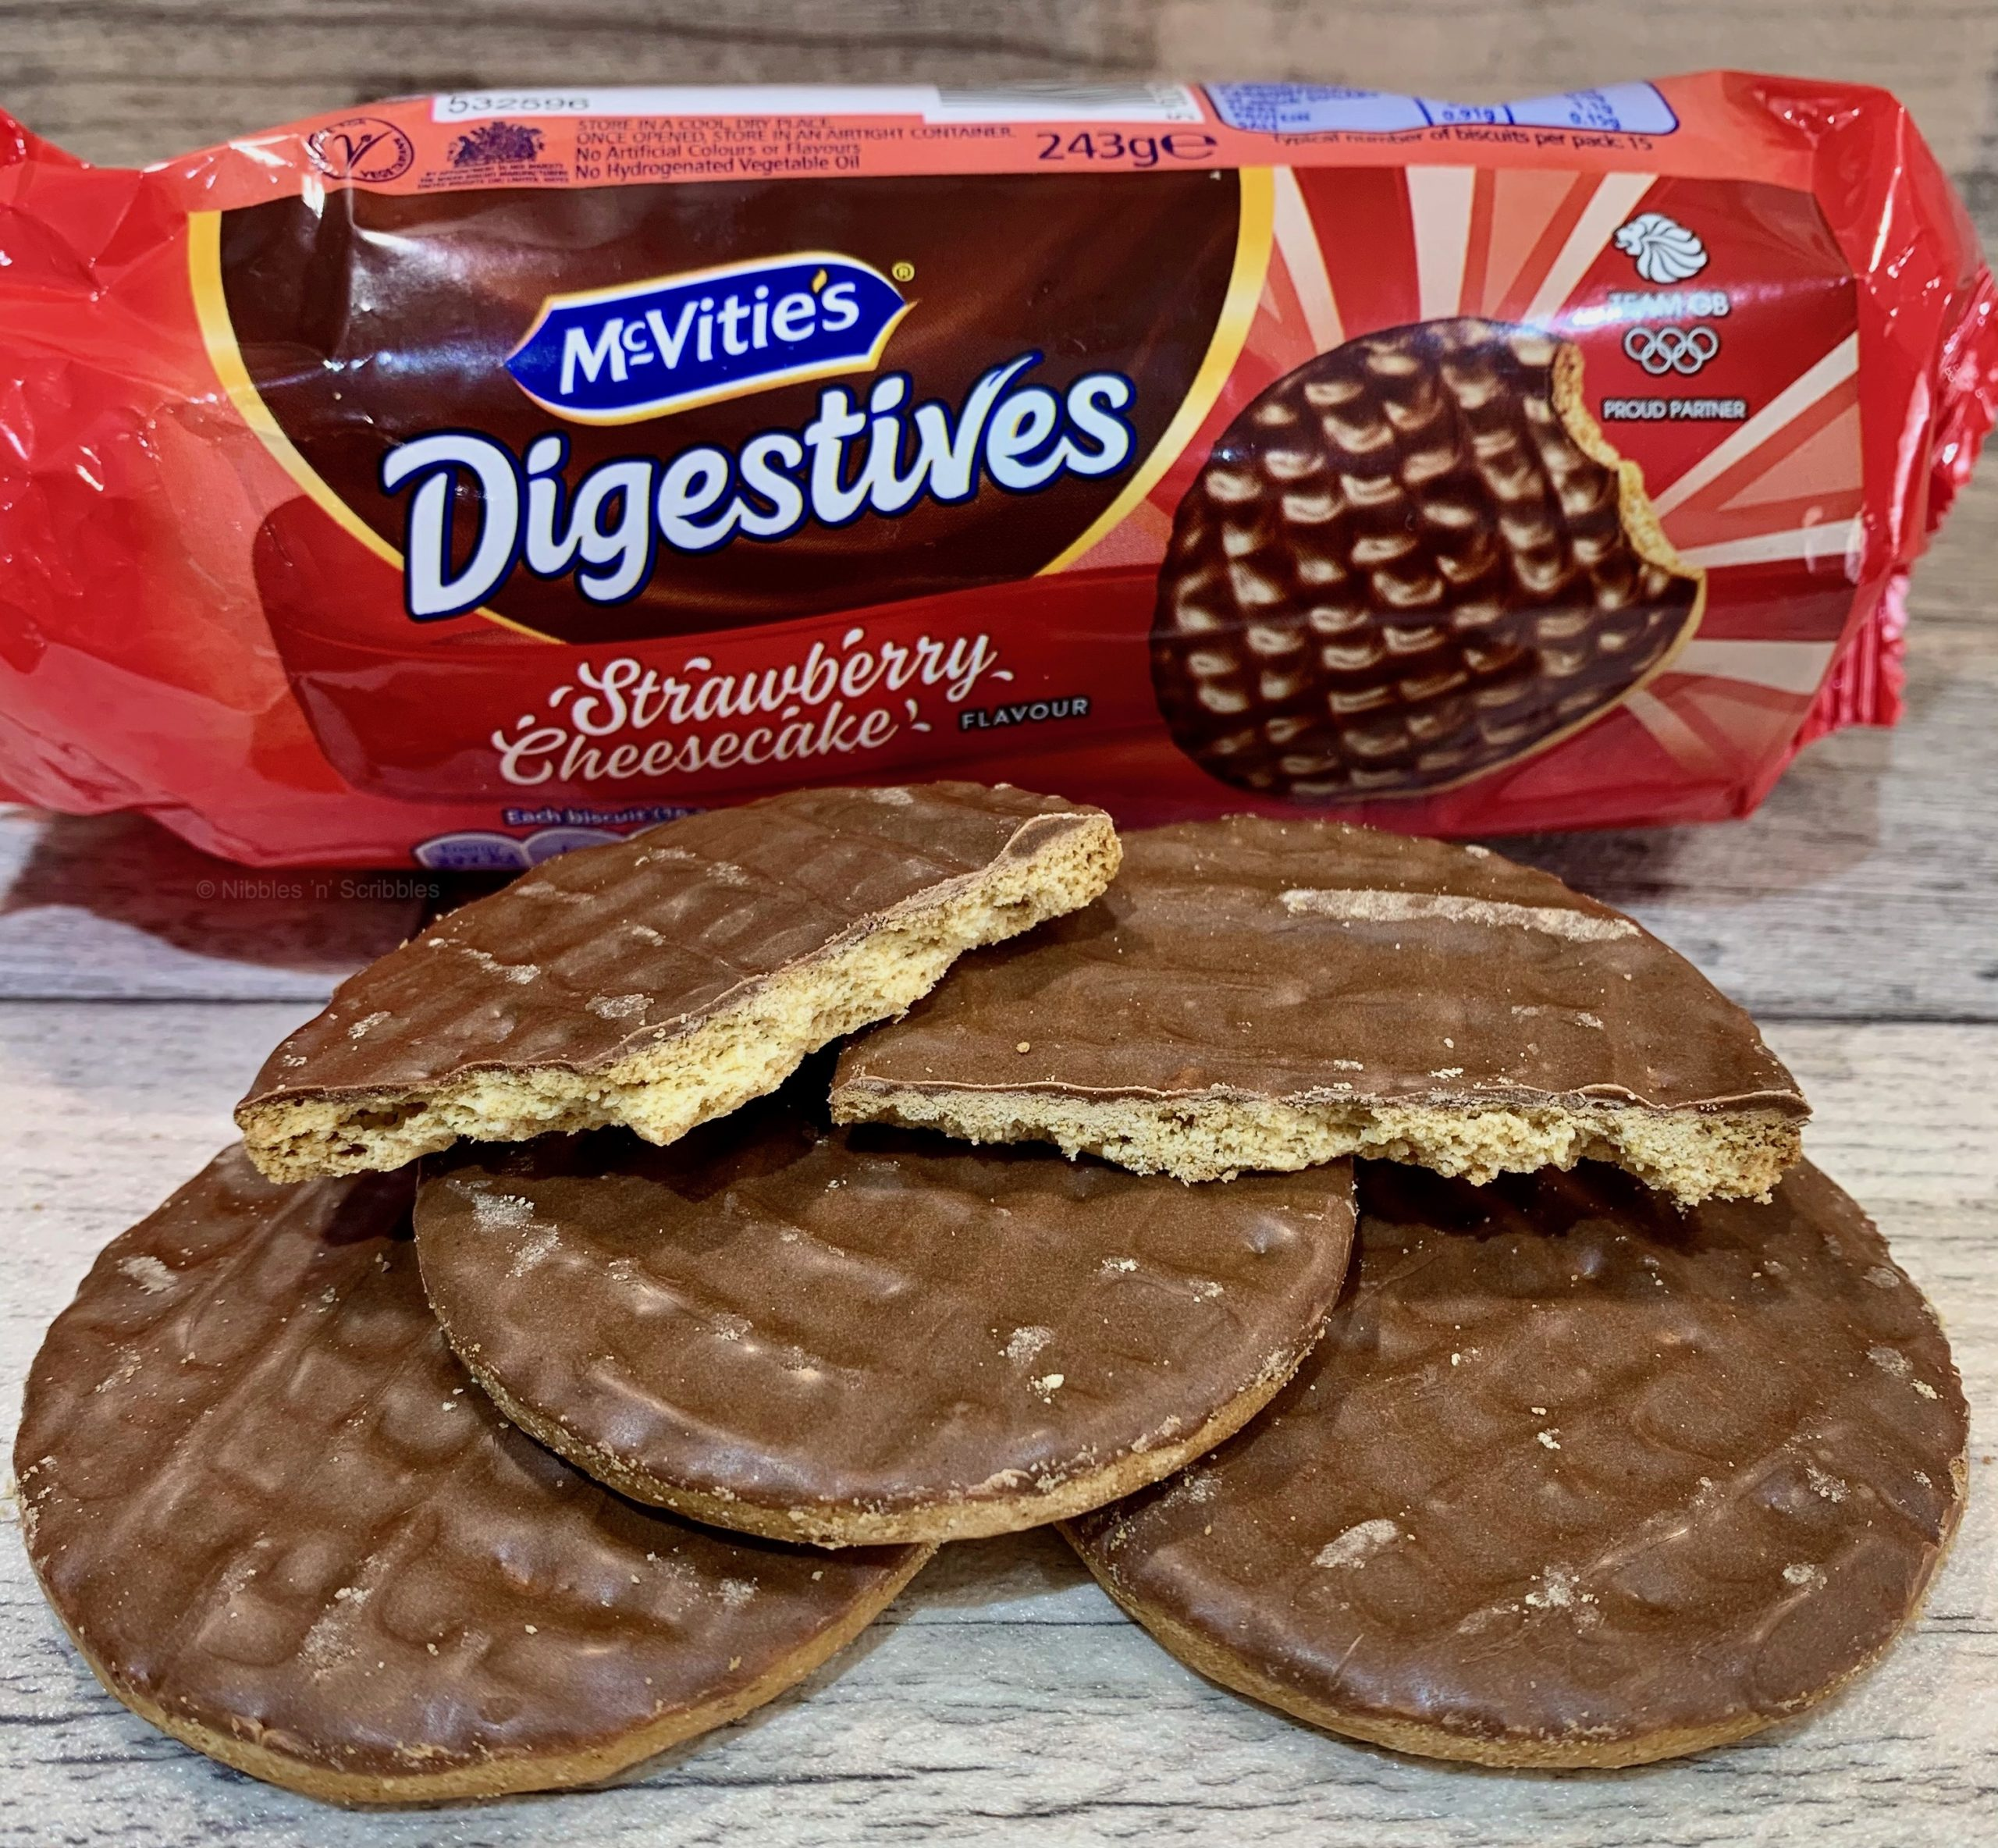 McVitie's Strawberry Cheesecake Digestives